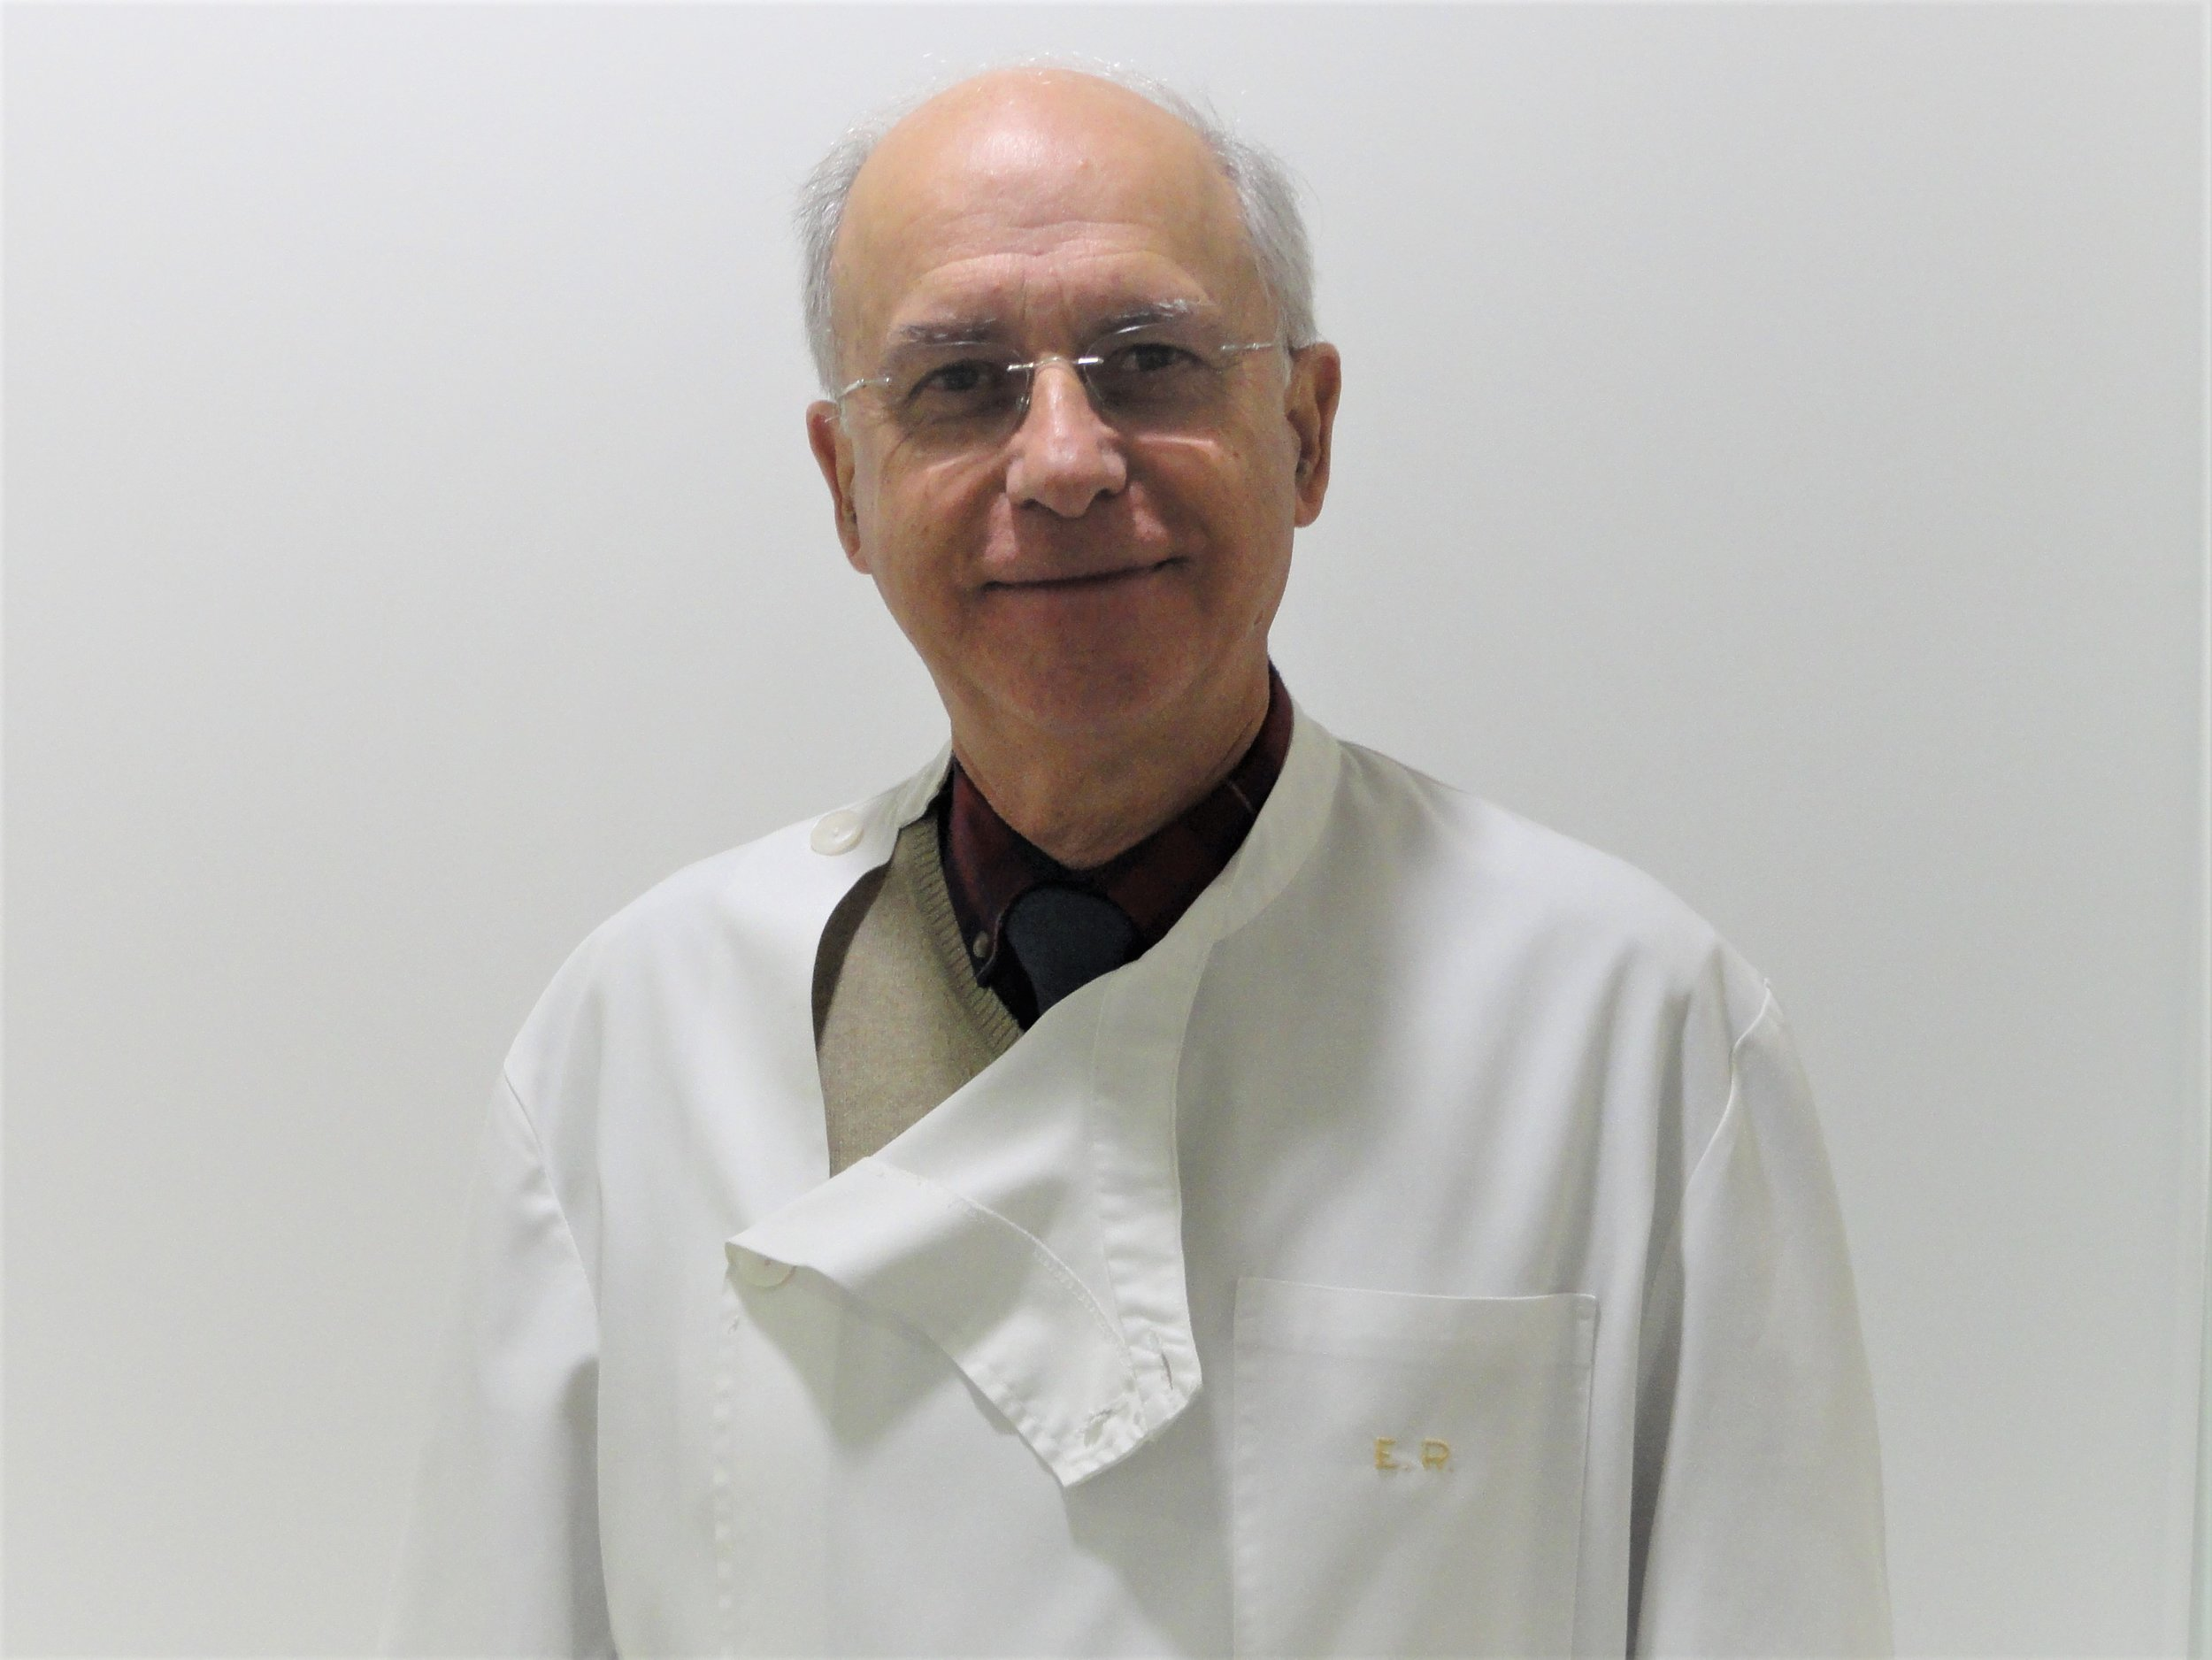 Prof. Dr. Evangelista Rocha copia- Cardiologia.jpg